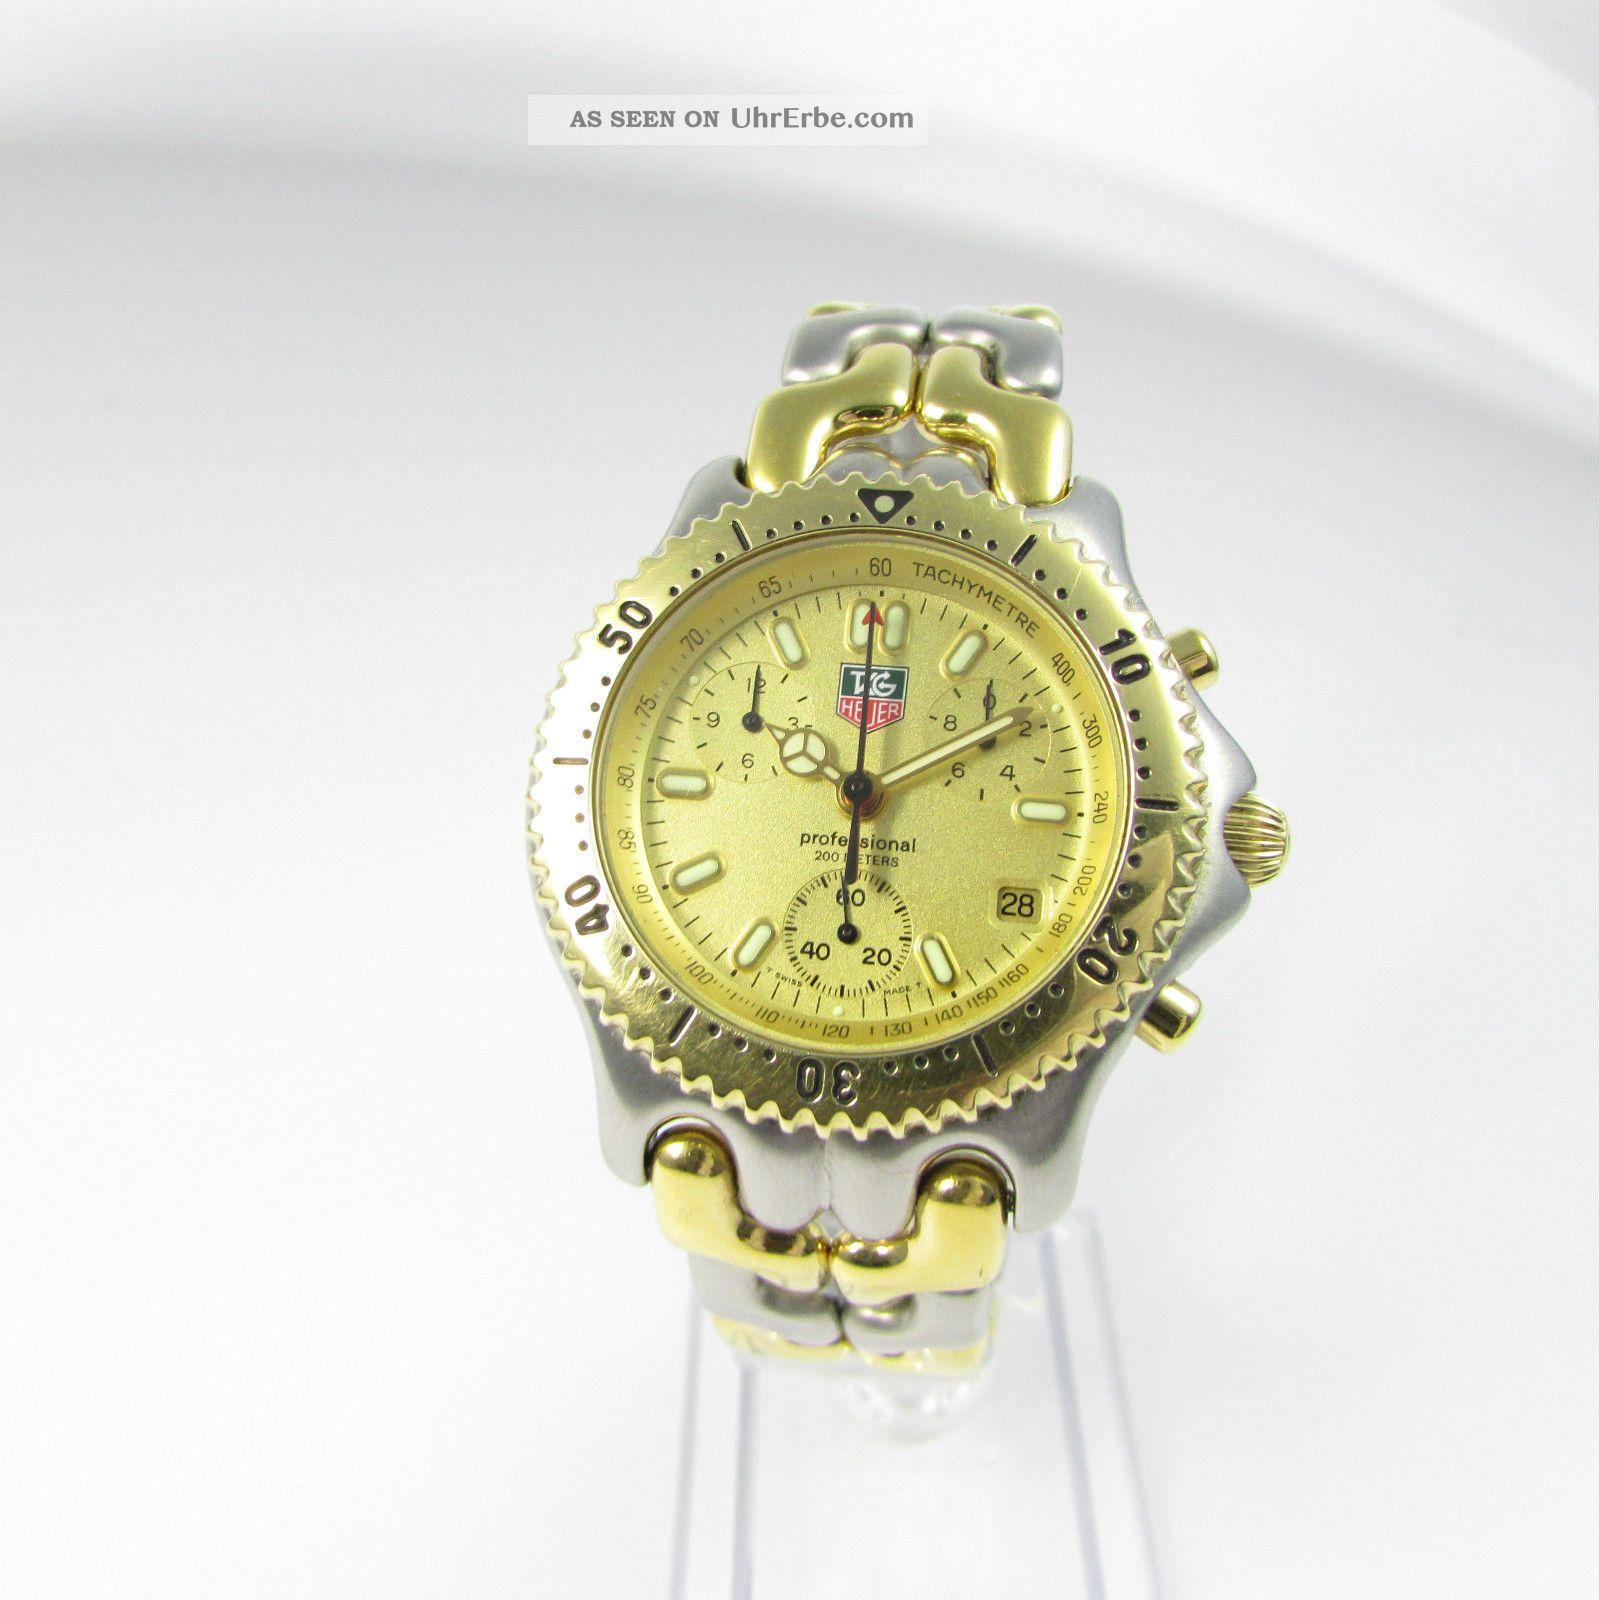 Tag Heuer Sel Professional Racing Chronograph - Bicolor Im Topzustand Armbanduhren Bild